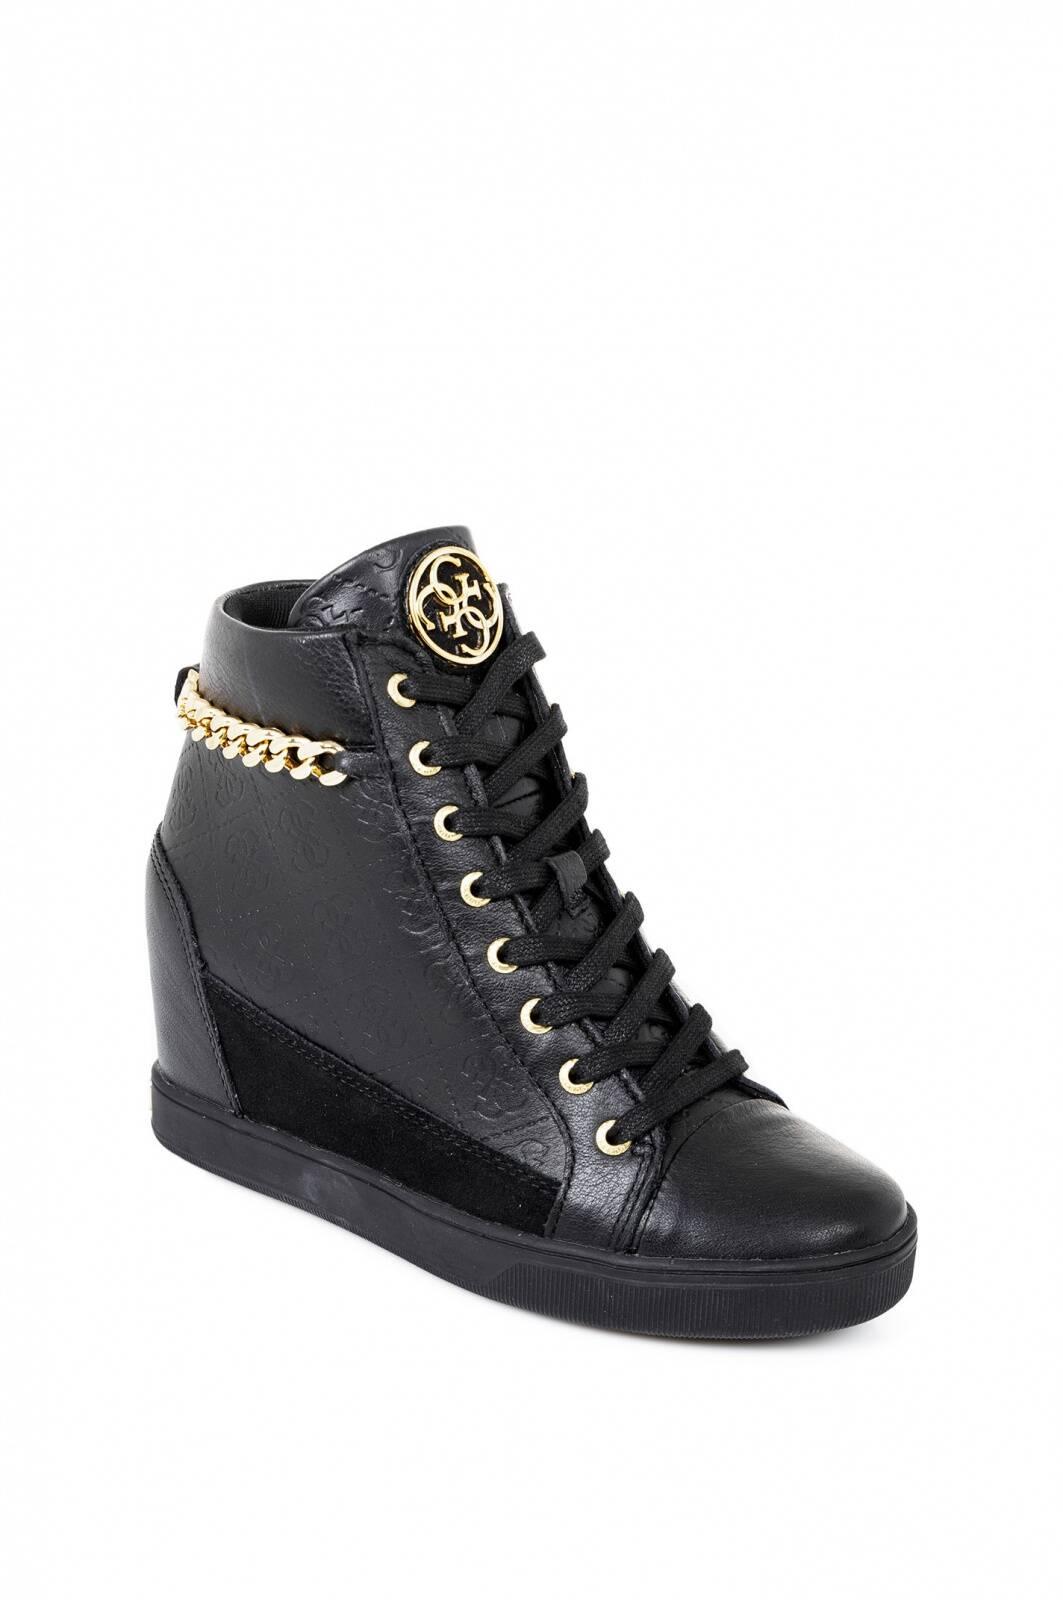 fe349e537 Furr Sneakers Guess | Black | Gomez.pl/en